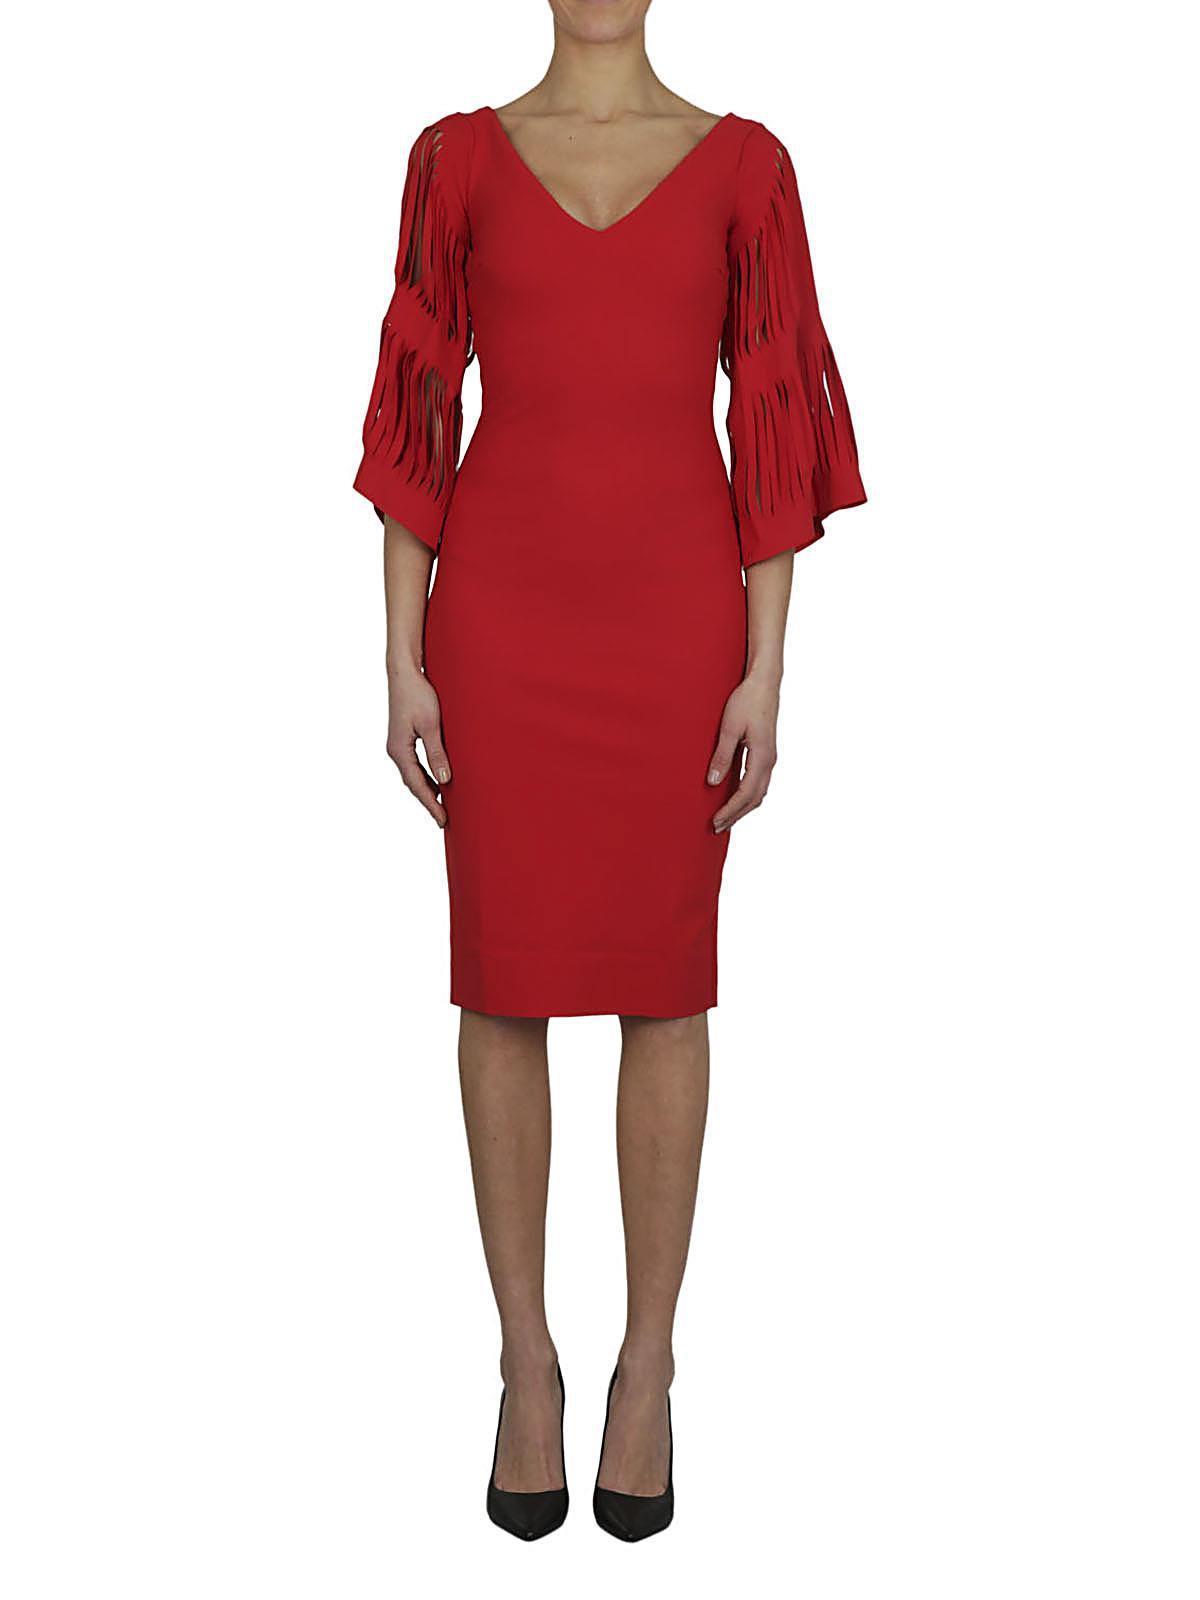 2638f614b527 Chiara Boni CHIARA BONI Abito tubino rosso in Red - Lyst